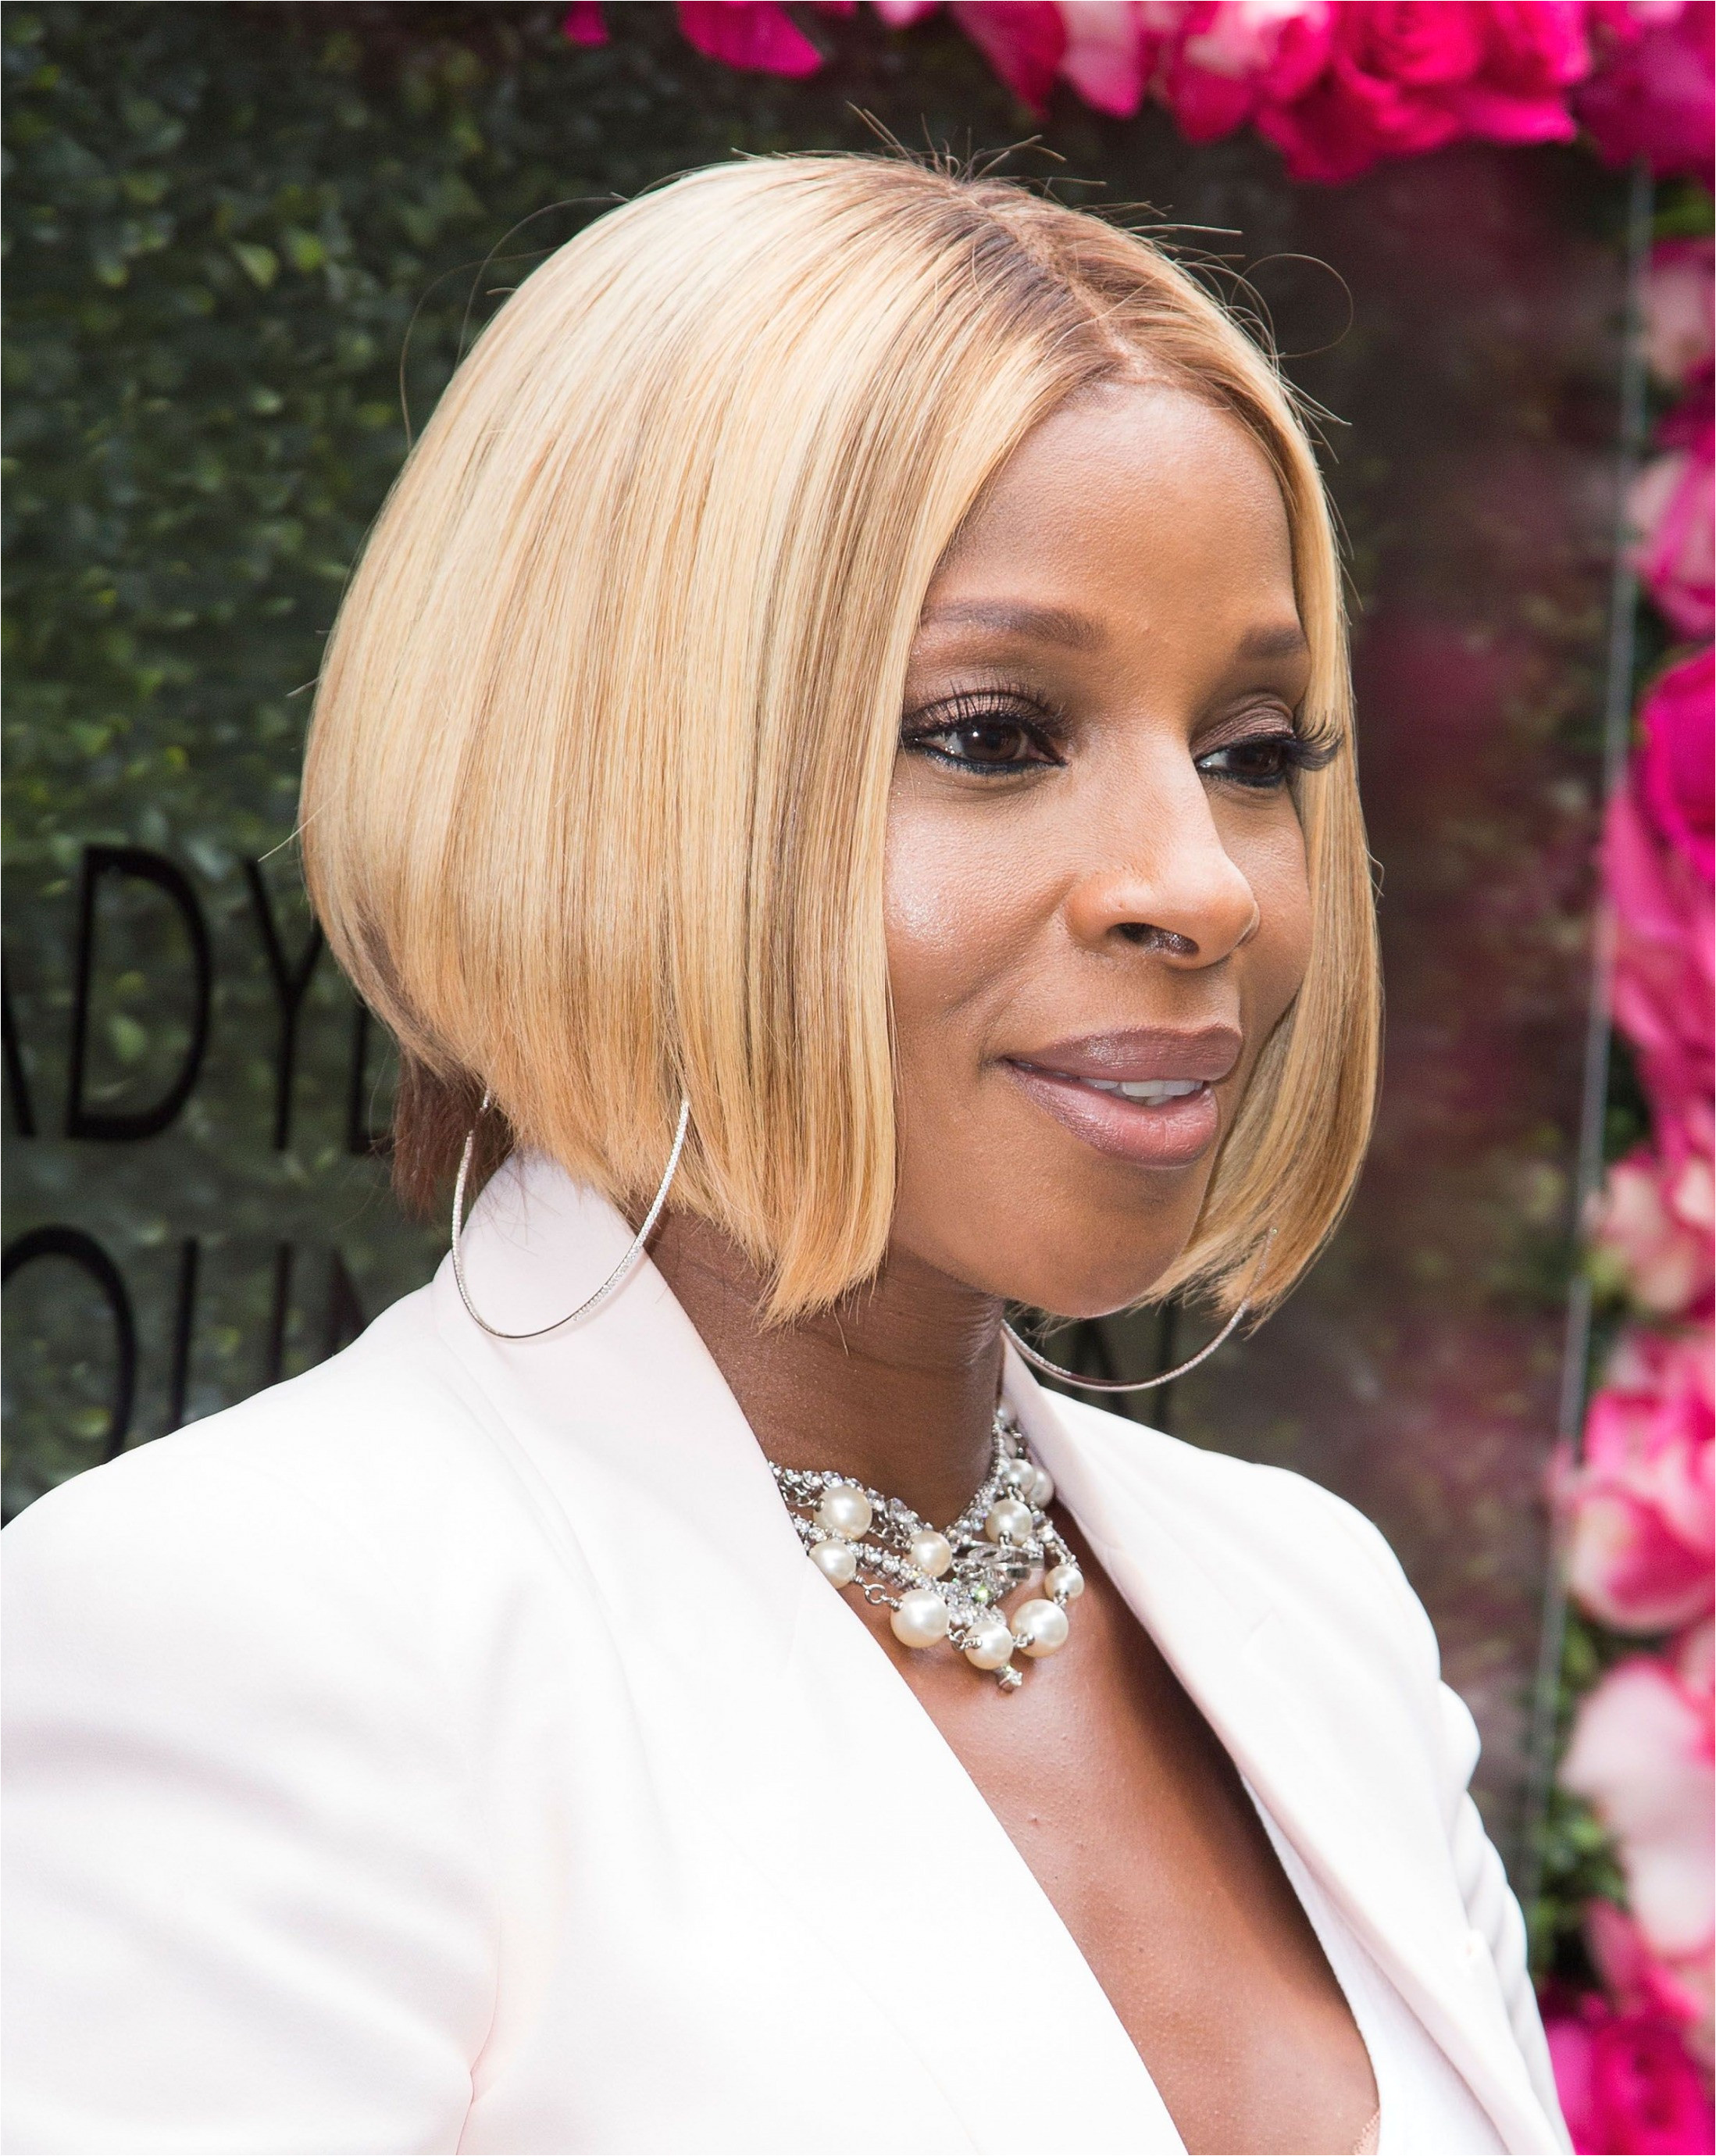 Black Girl Hairstyles for Weddings Luxury Updos for Bob Hairstyles Black Updo Hairstyles Elegant Bobs